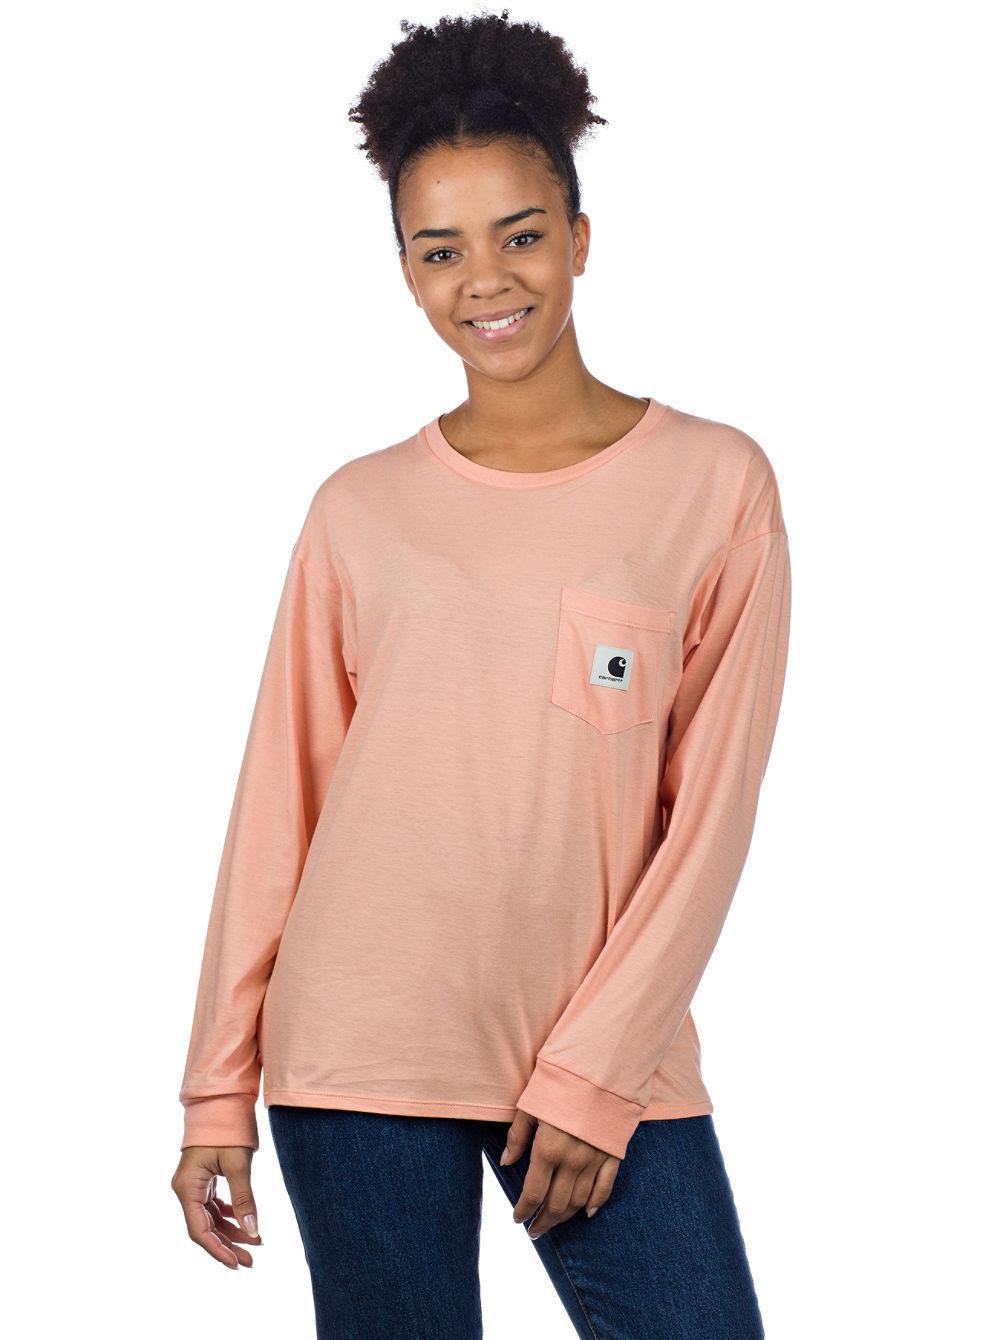 aa12a3c92a5 Compra Carhartt WIP Pocket Camiseta en línea en Blue Tomato